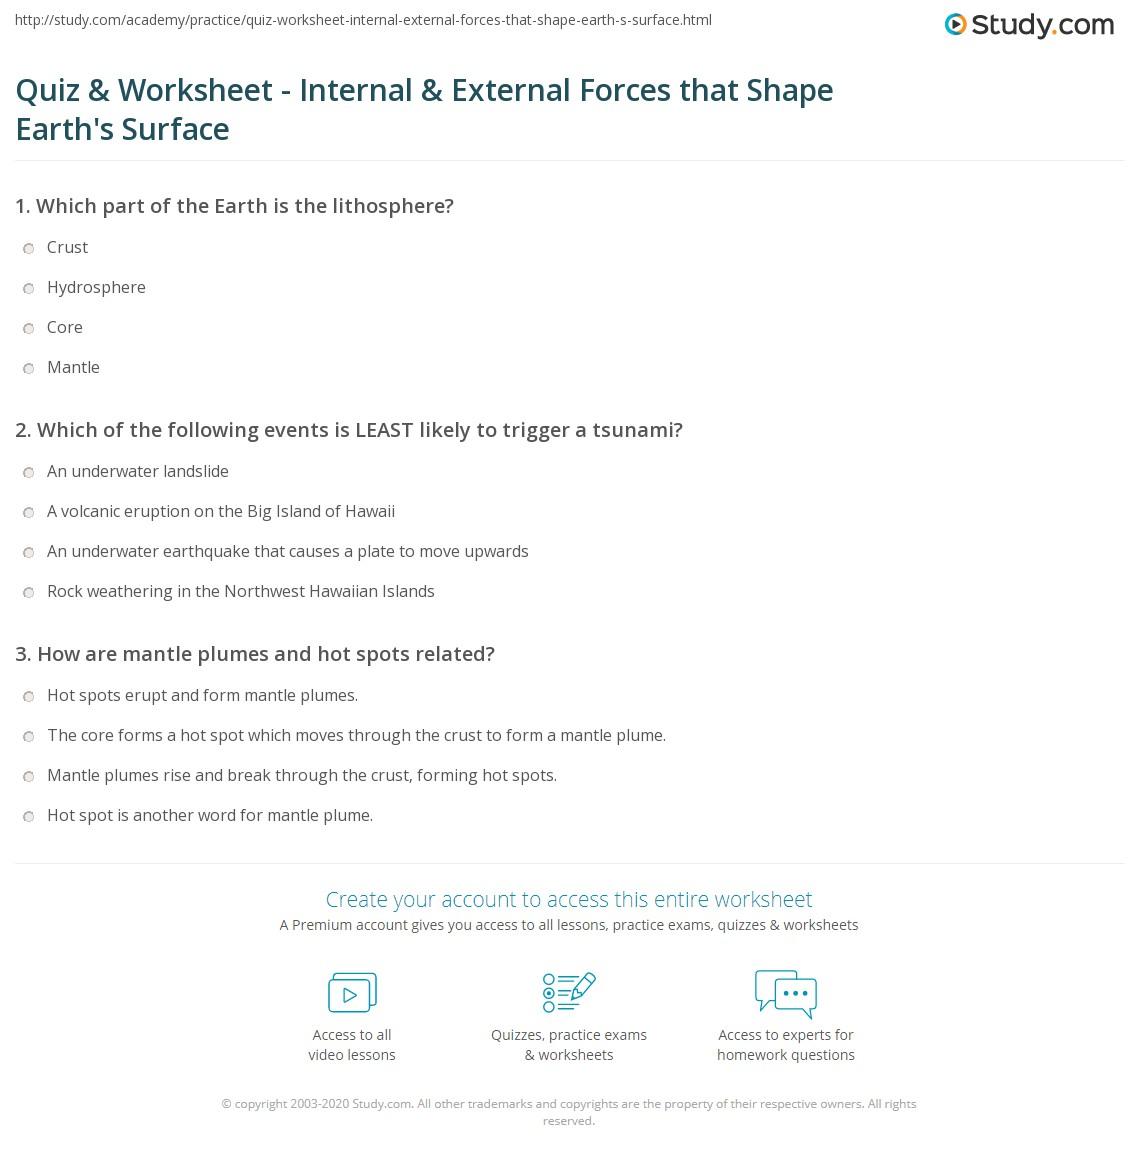 hight resolution of Quiz \u0026 Worksheet - Internal \u0026 External Forces that Shape Earth's Surface    Study.com